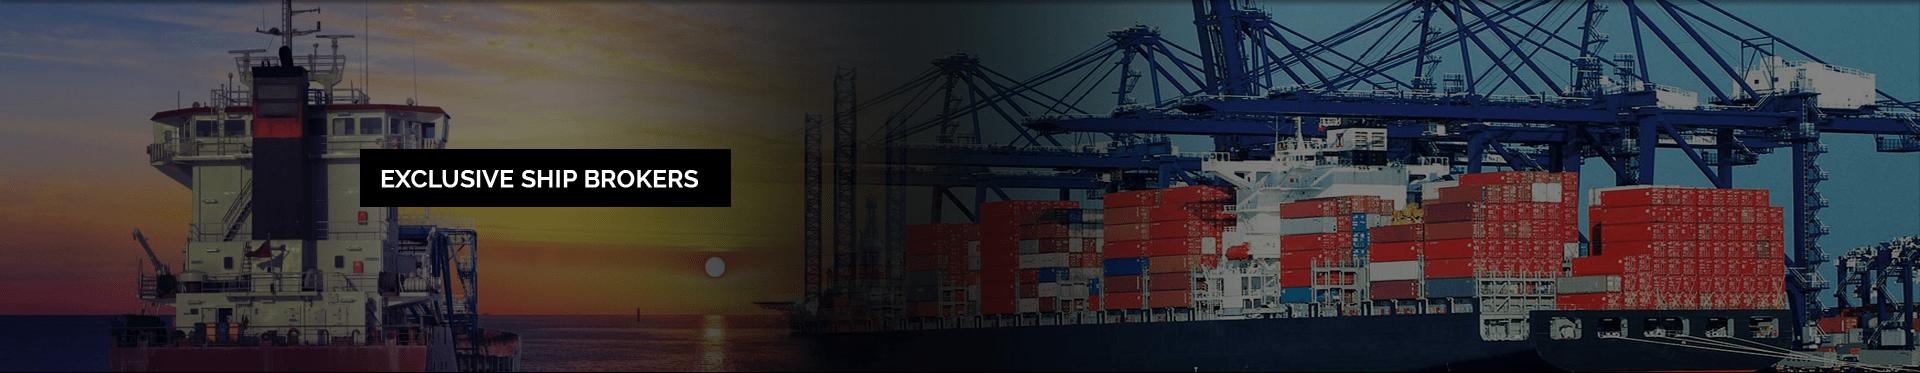 Ship Chartering Company LPG Ship Roro Vessel Fsru Selaata Fsru Lebanon